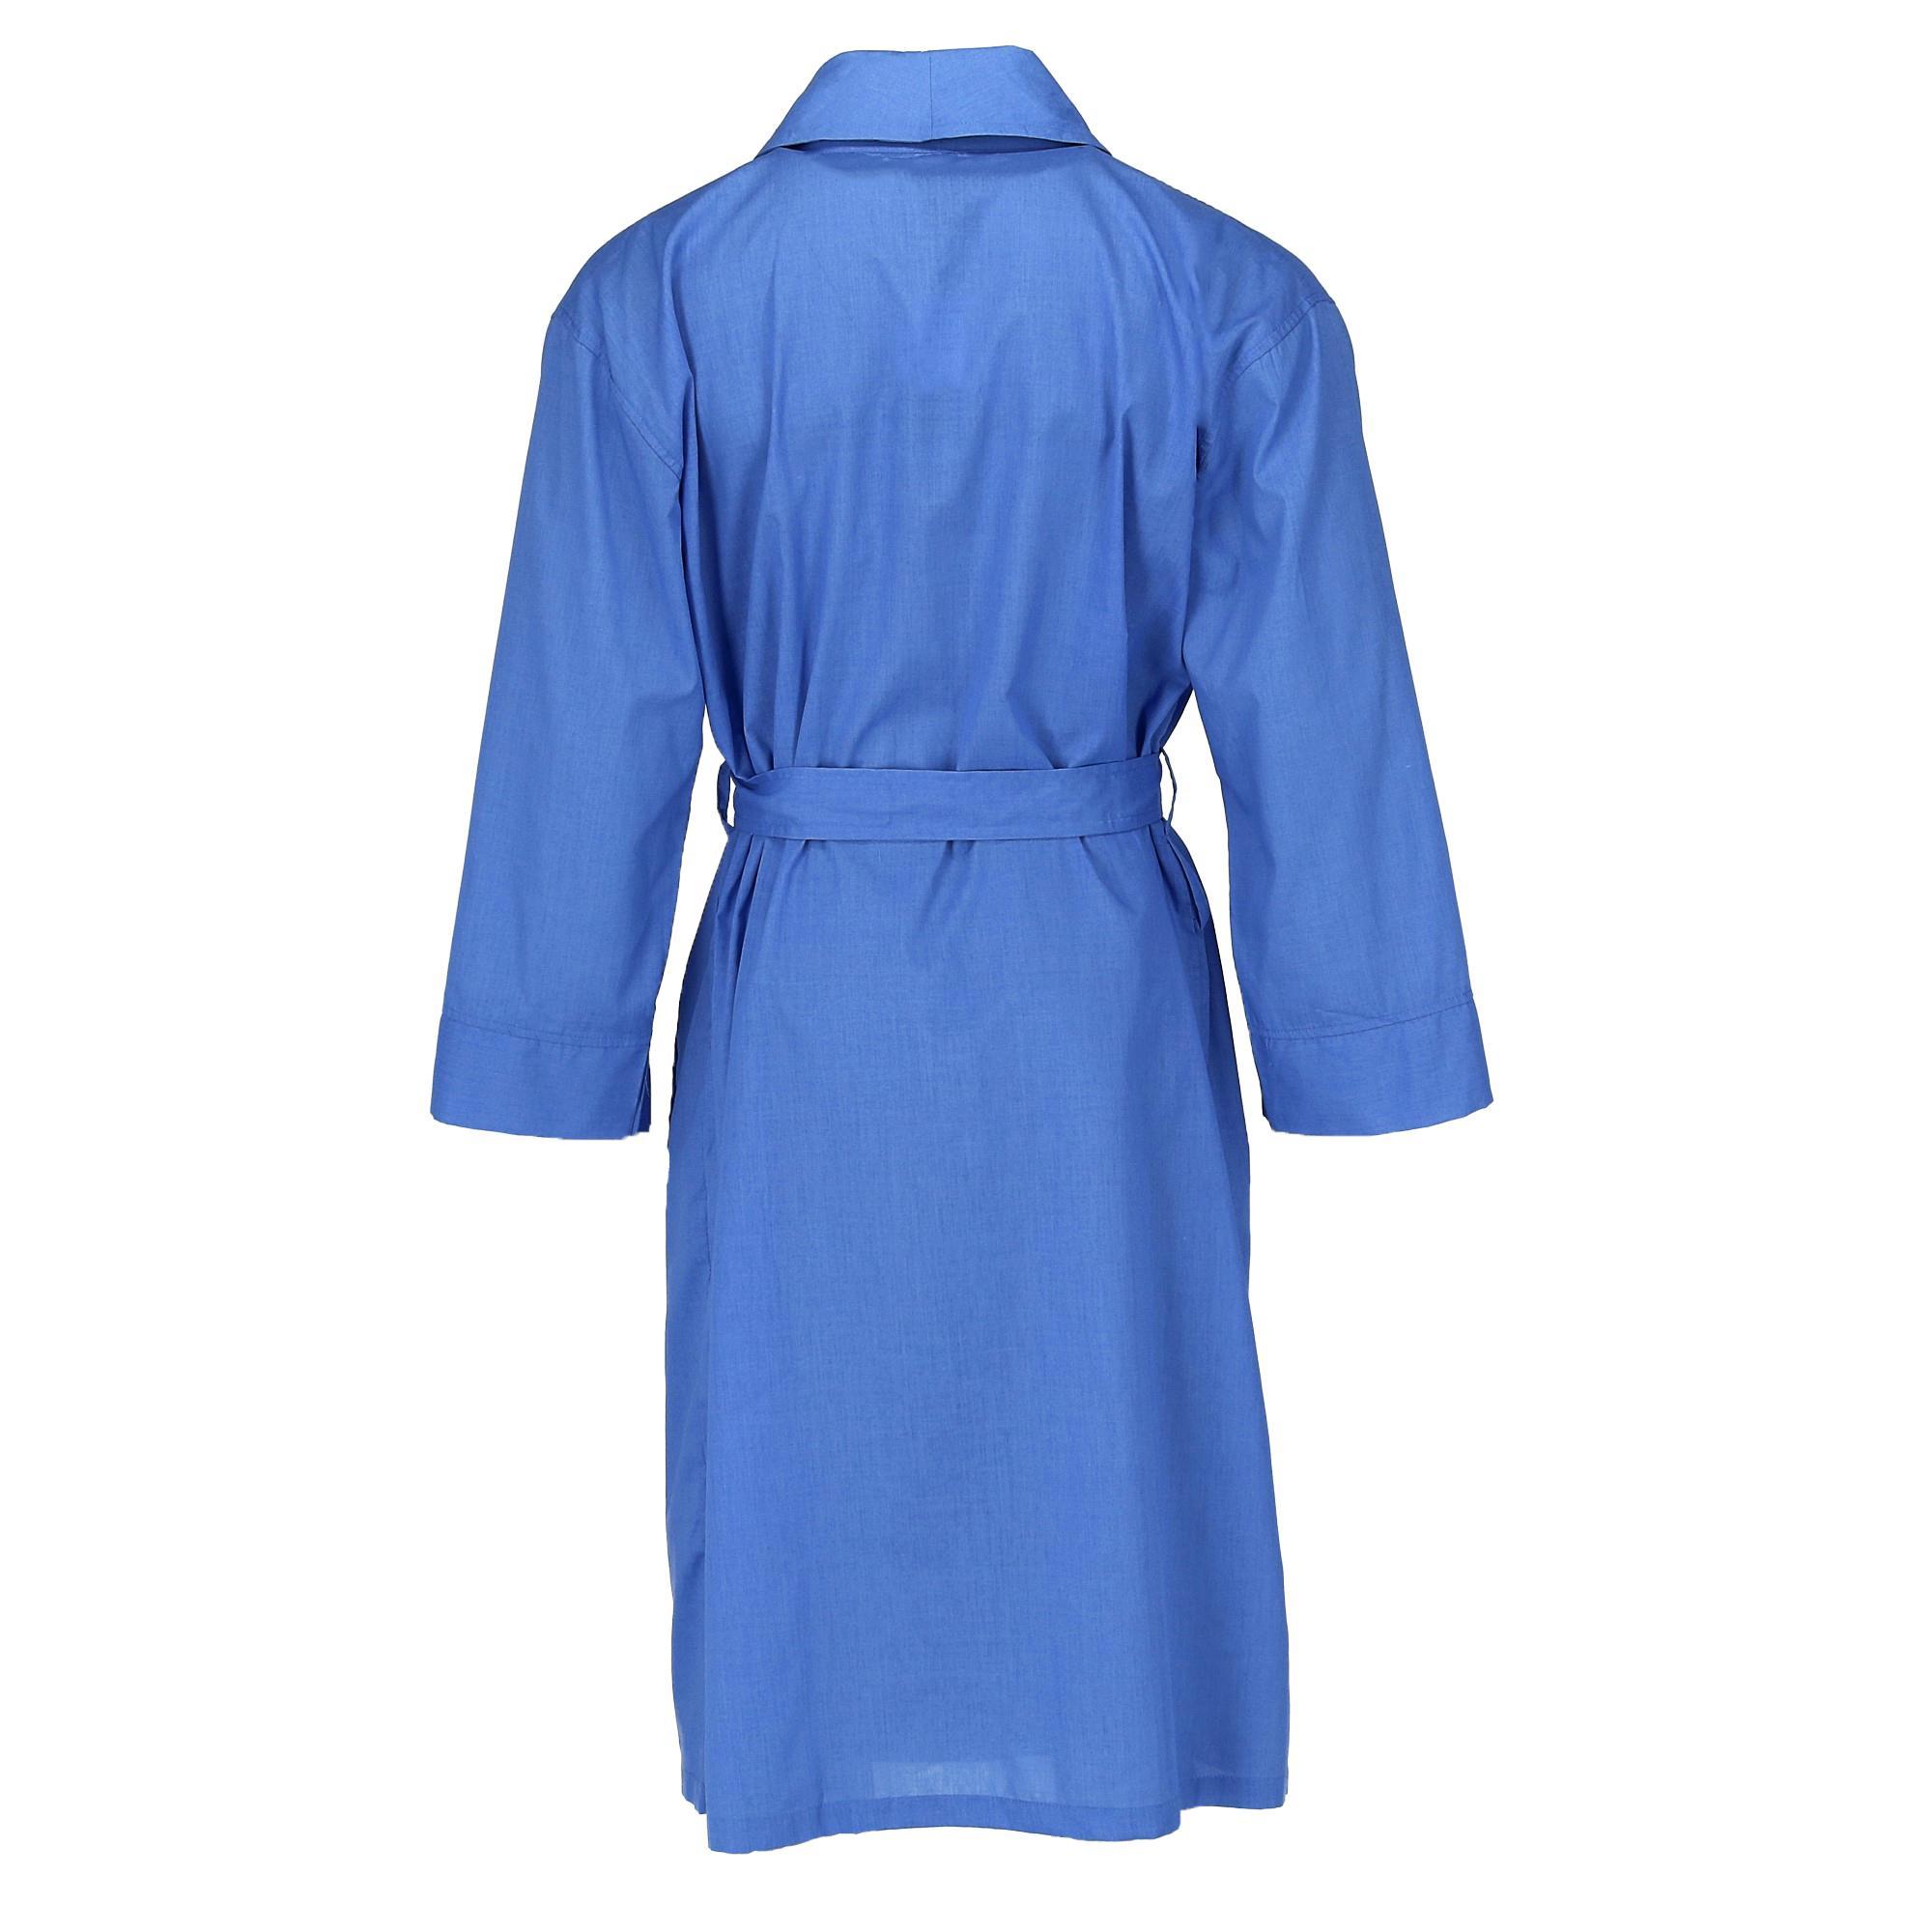 Hanes Mens Lightweight Woven Robe Tall Sizes